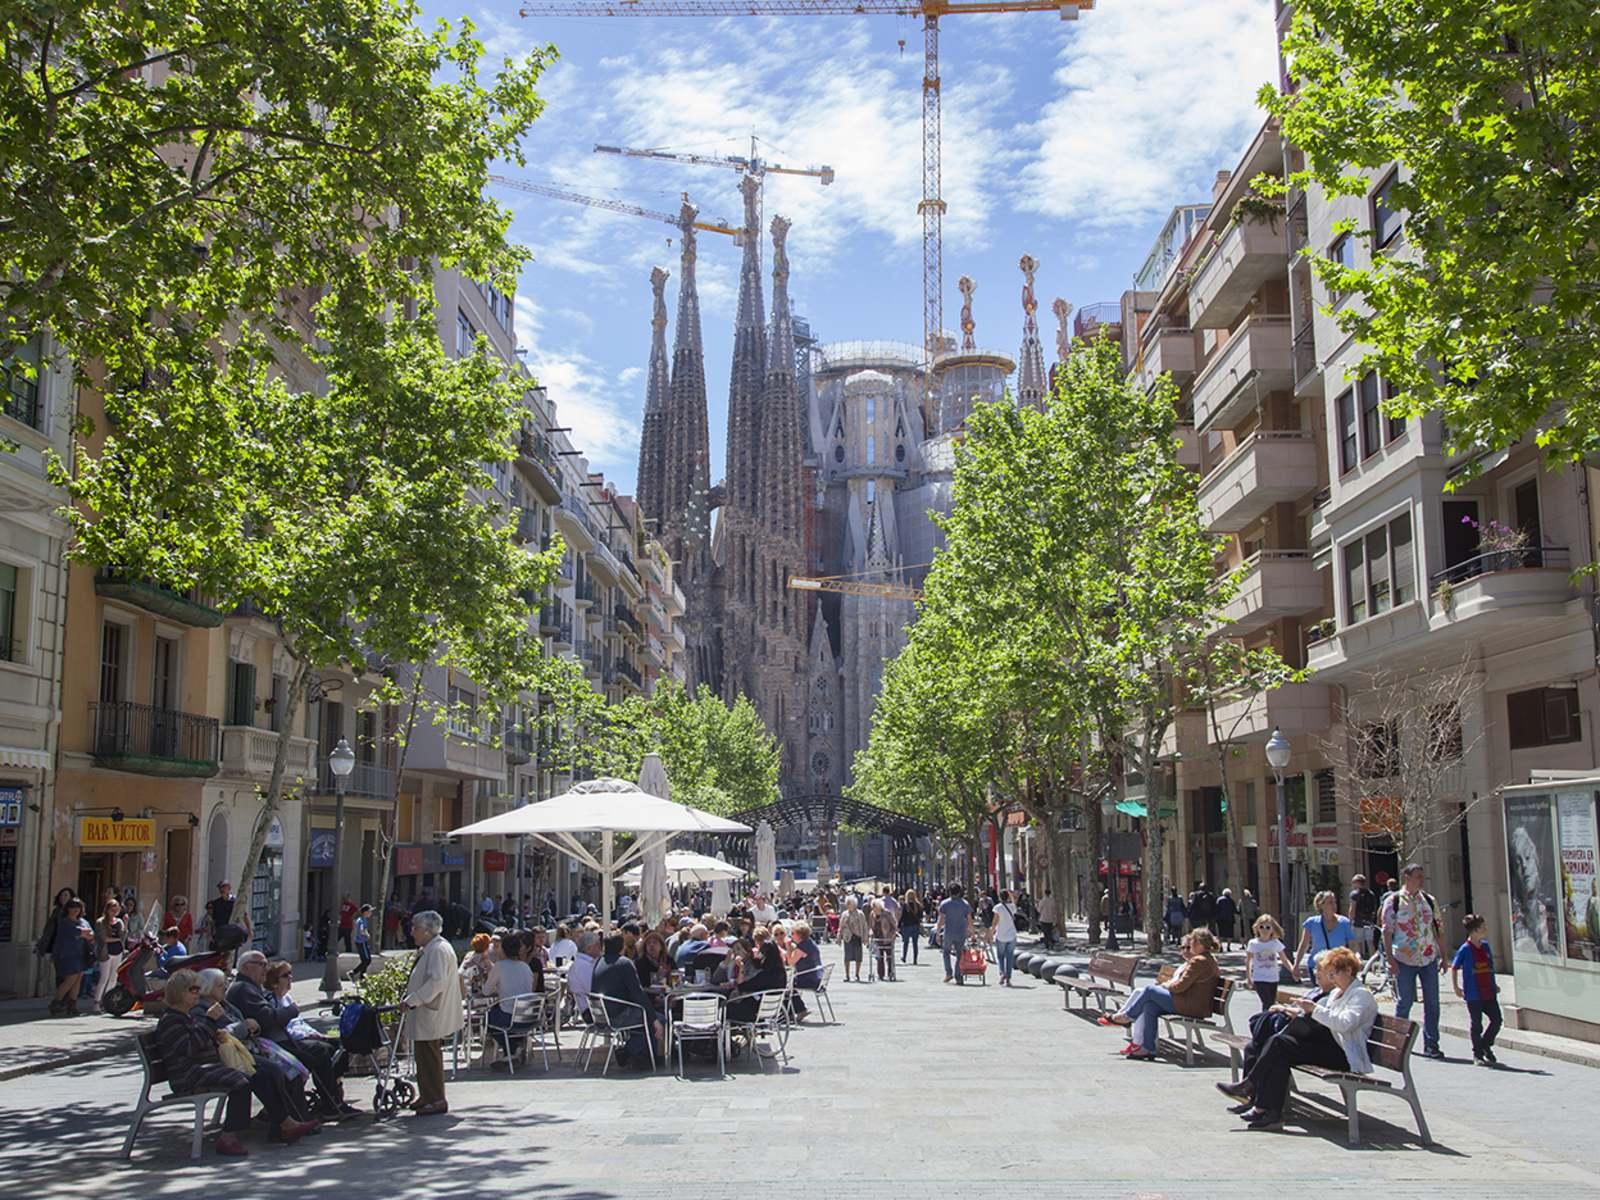 Eixample district in Barcelona, Teresa Helbig's headquarters.